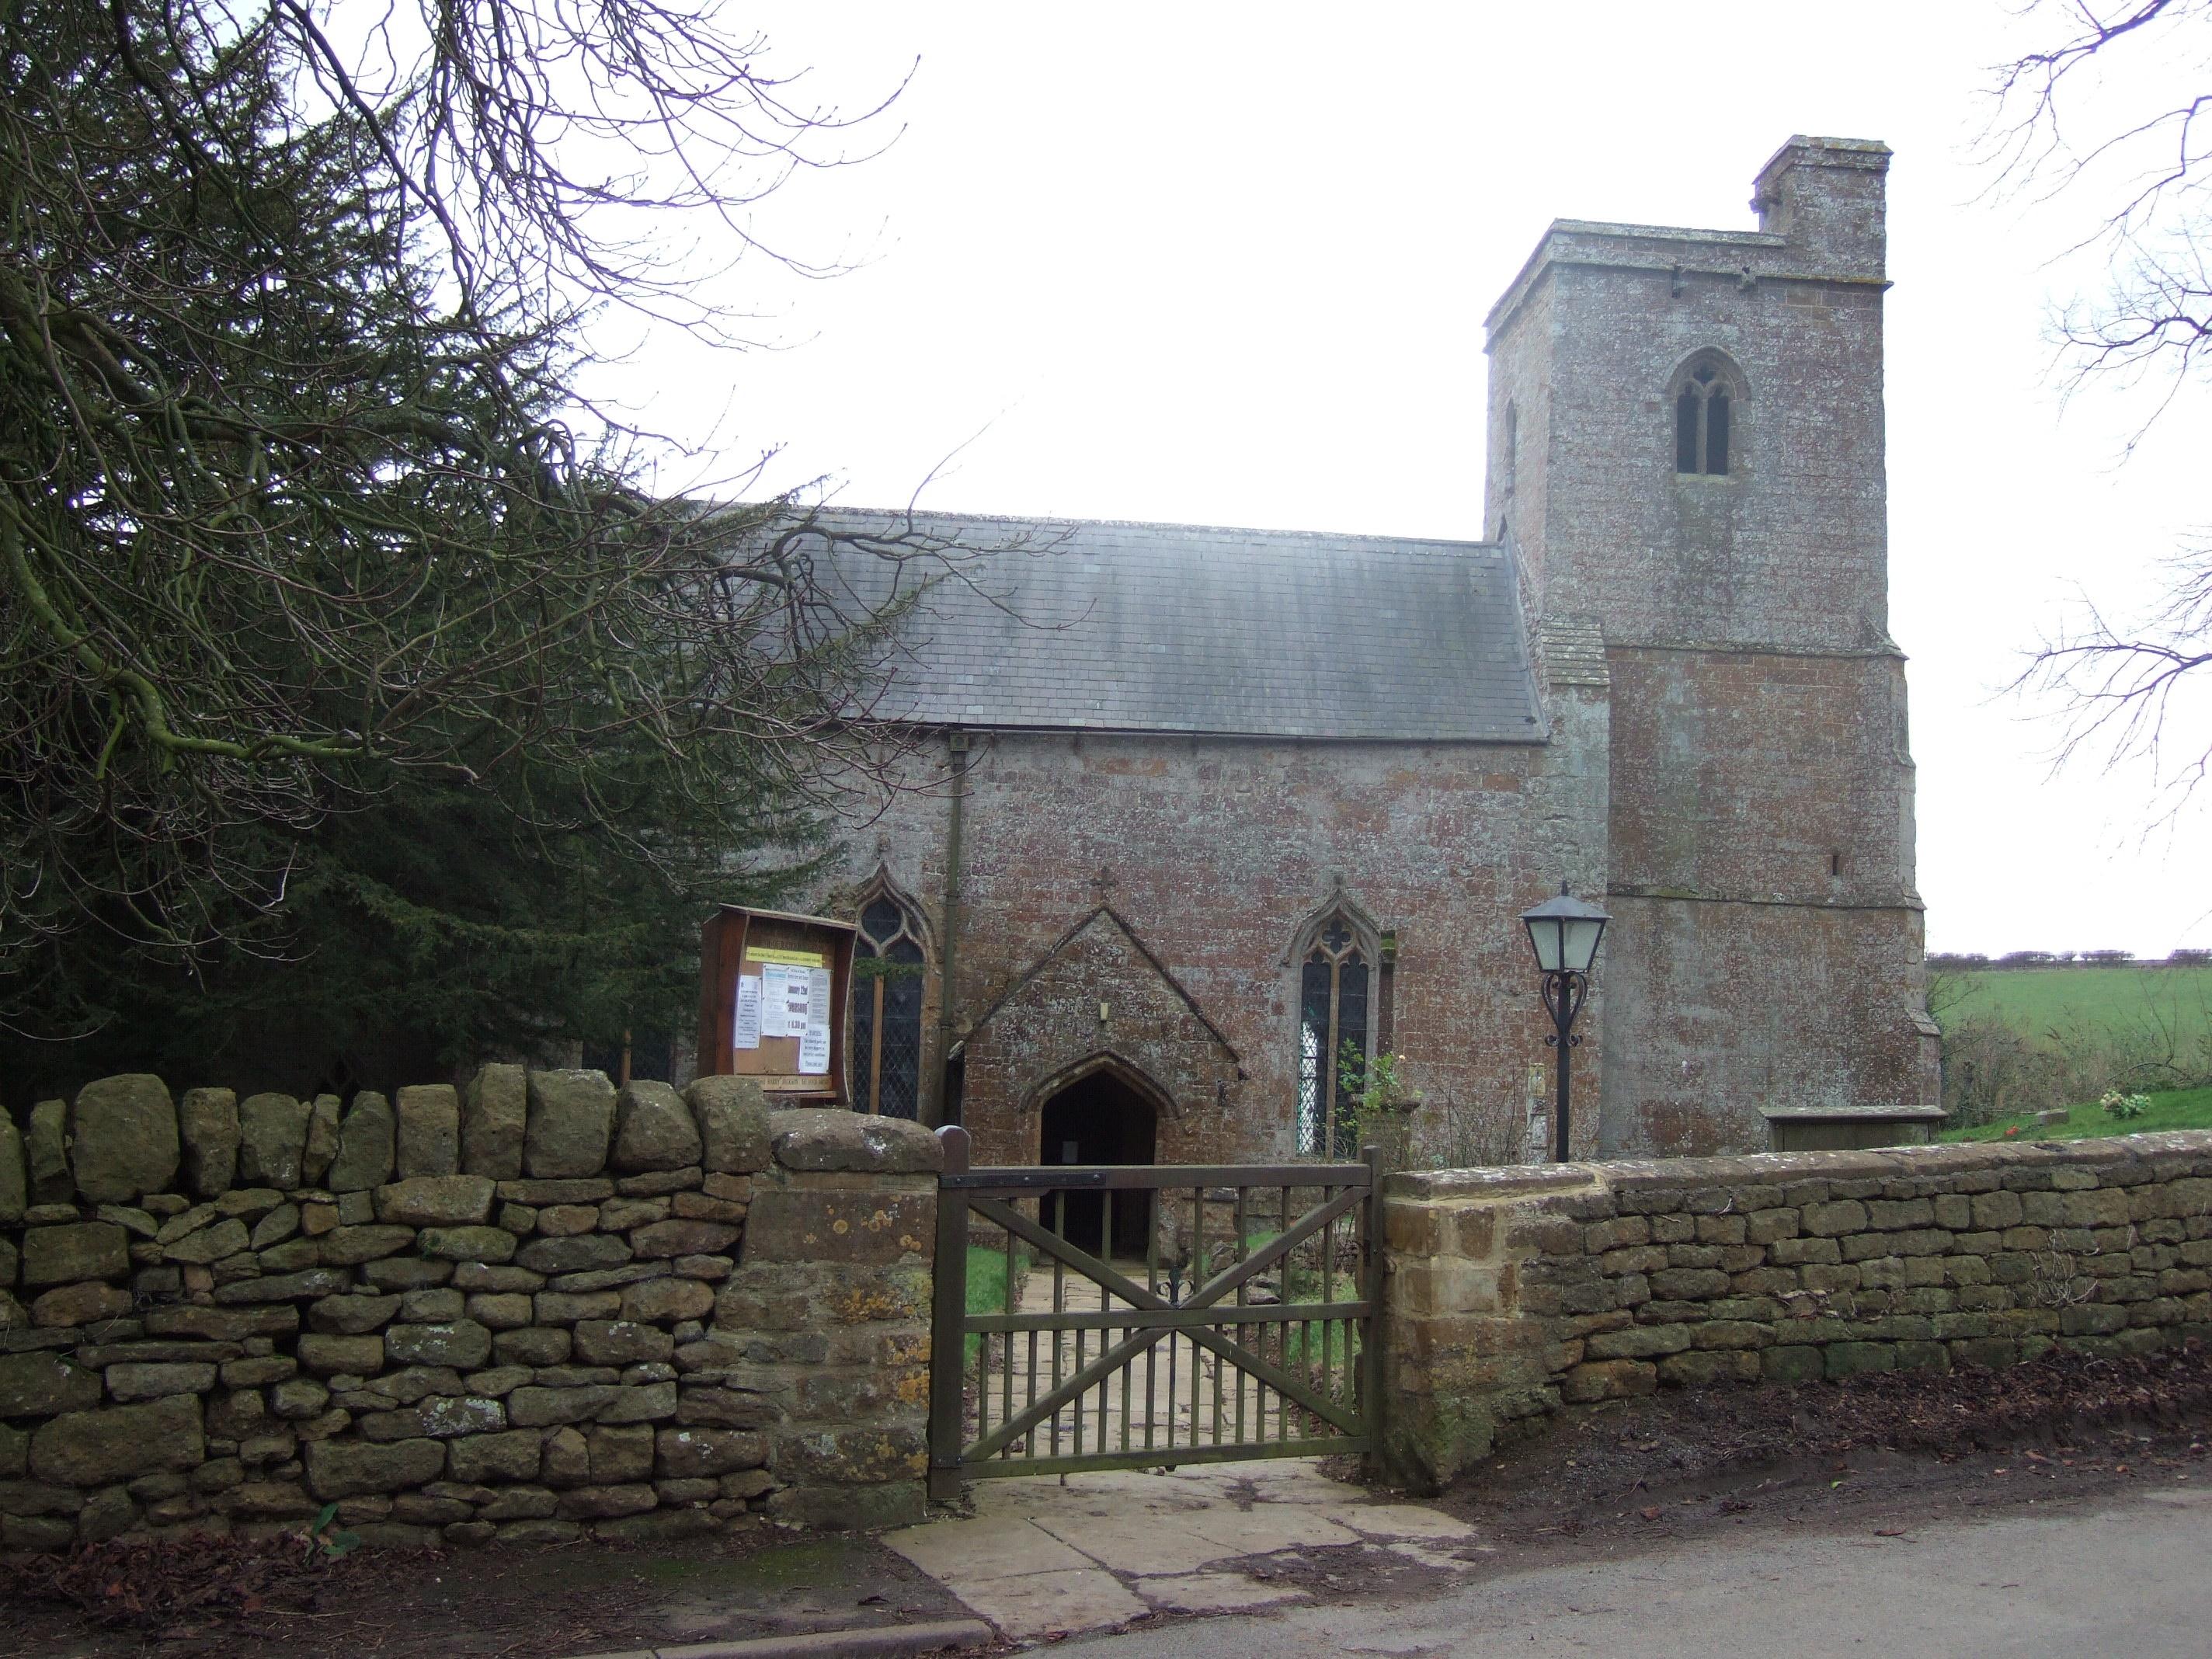 Ratley St Peter ad Vincula church 2(credit St Peter ad Vincula)